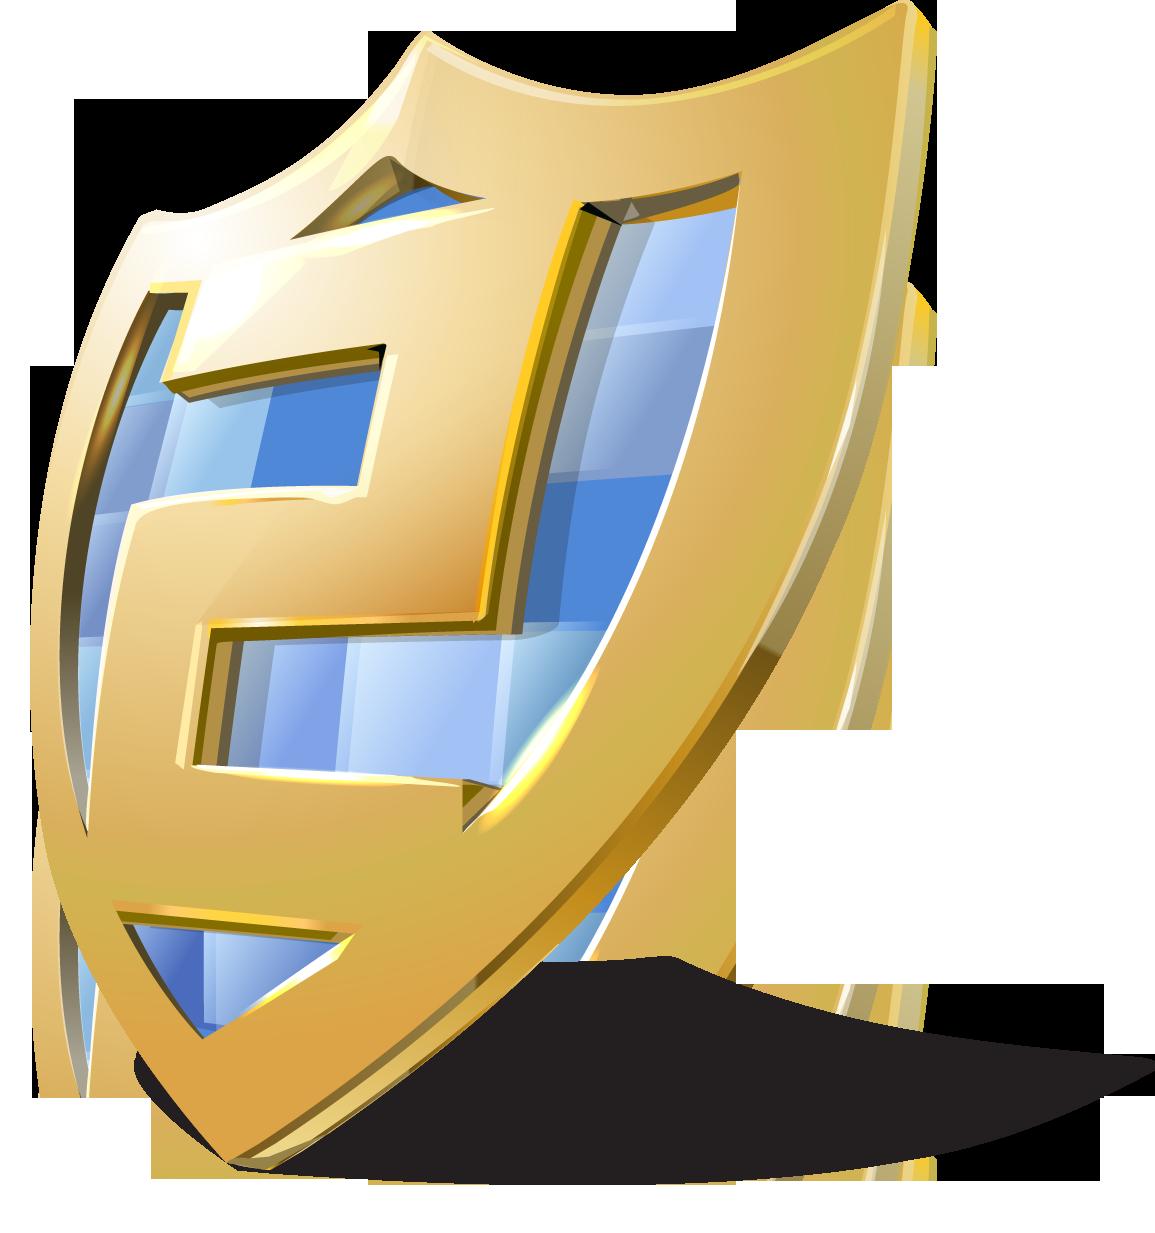 Скачать Антивирус Panda Antivirus 2009 Pro v3.00.00 update v 8 ...